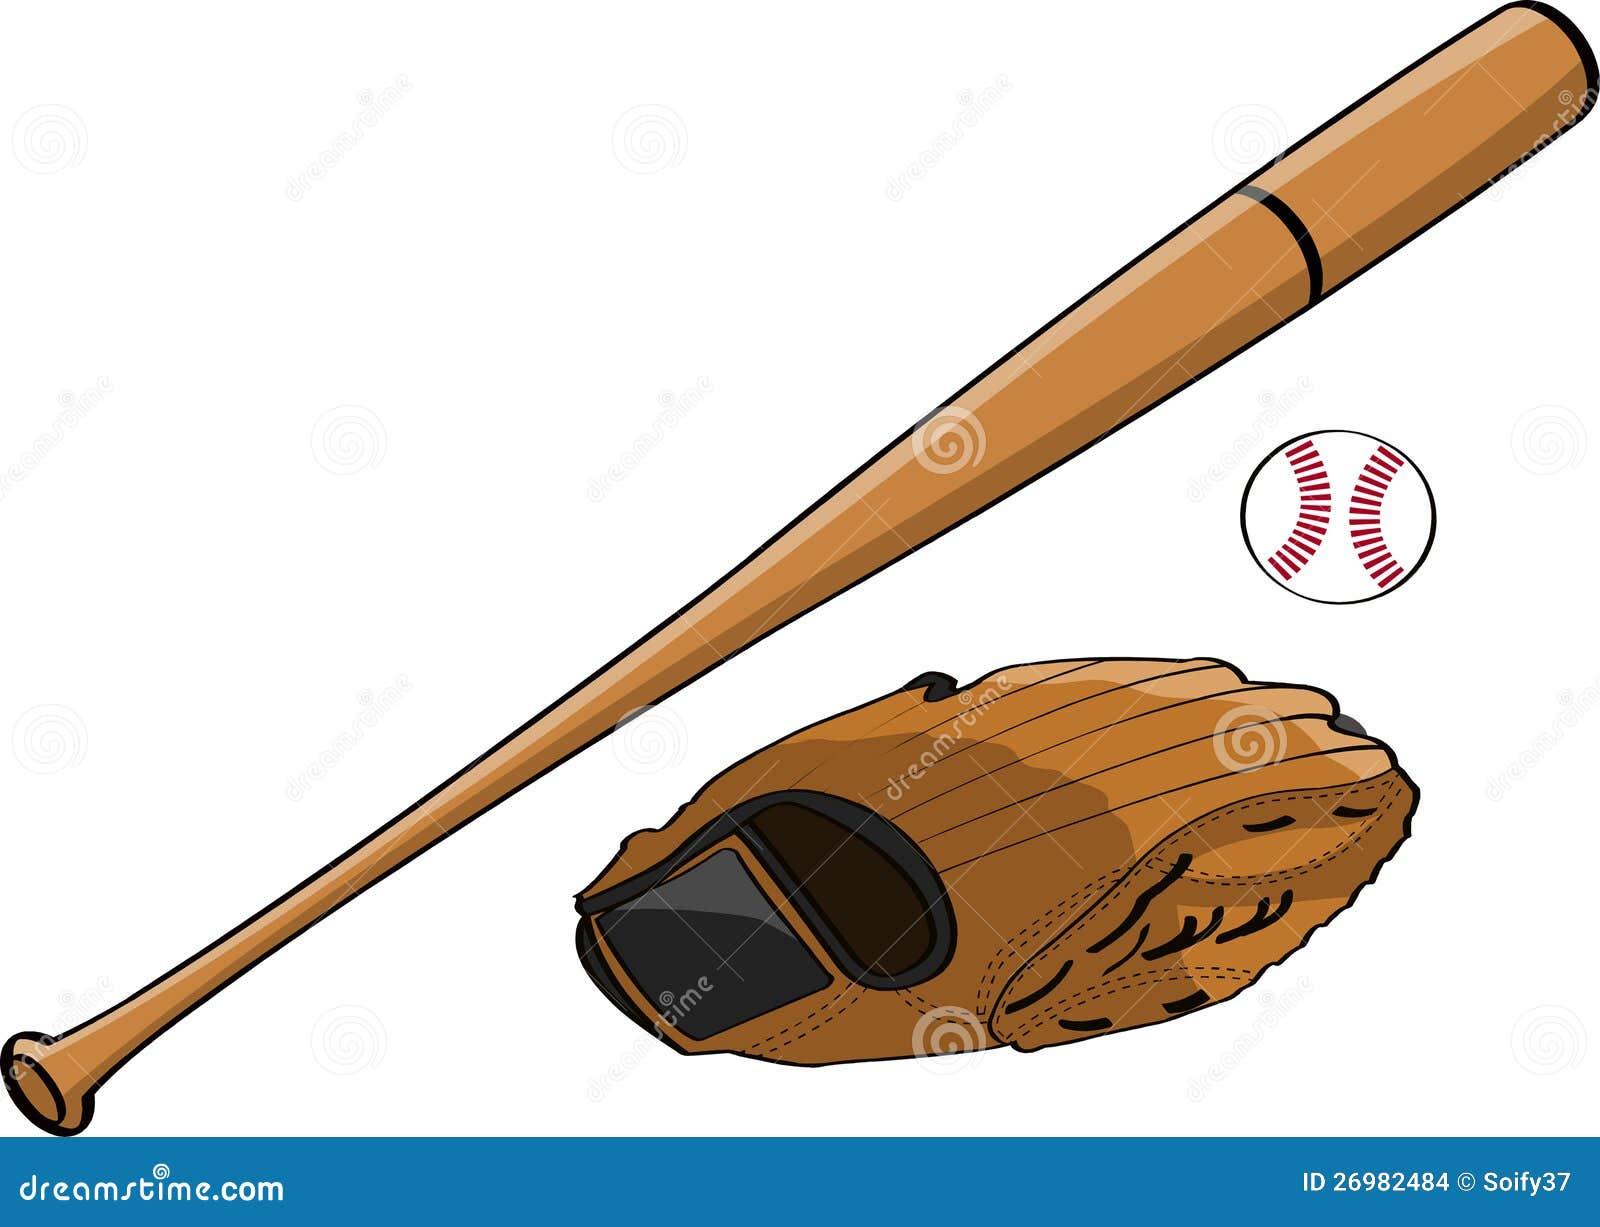 Baseball Bat, Glove And Ball Stock Illustration ...